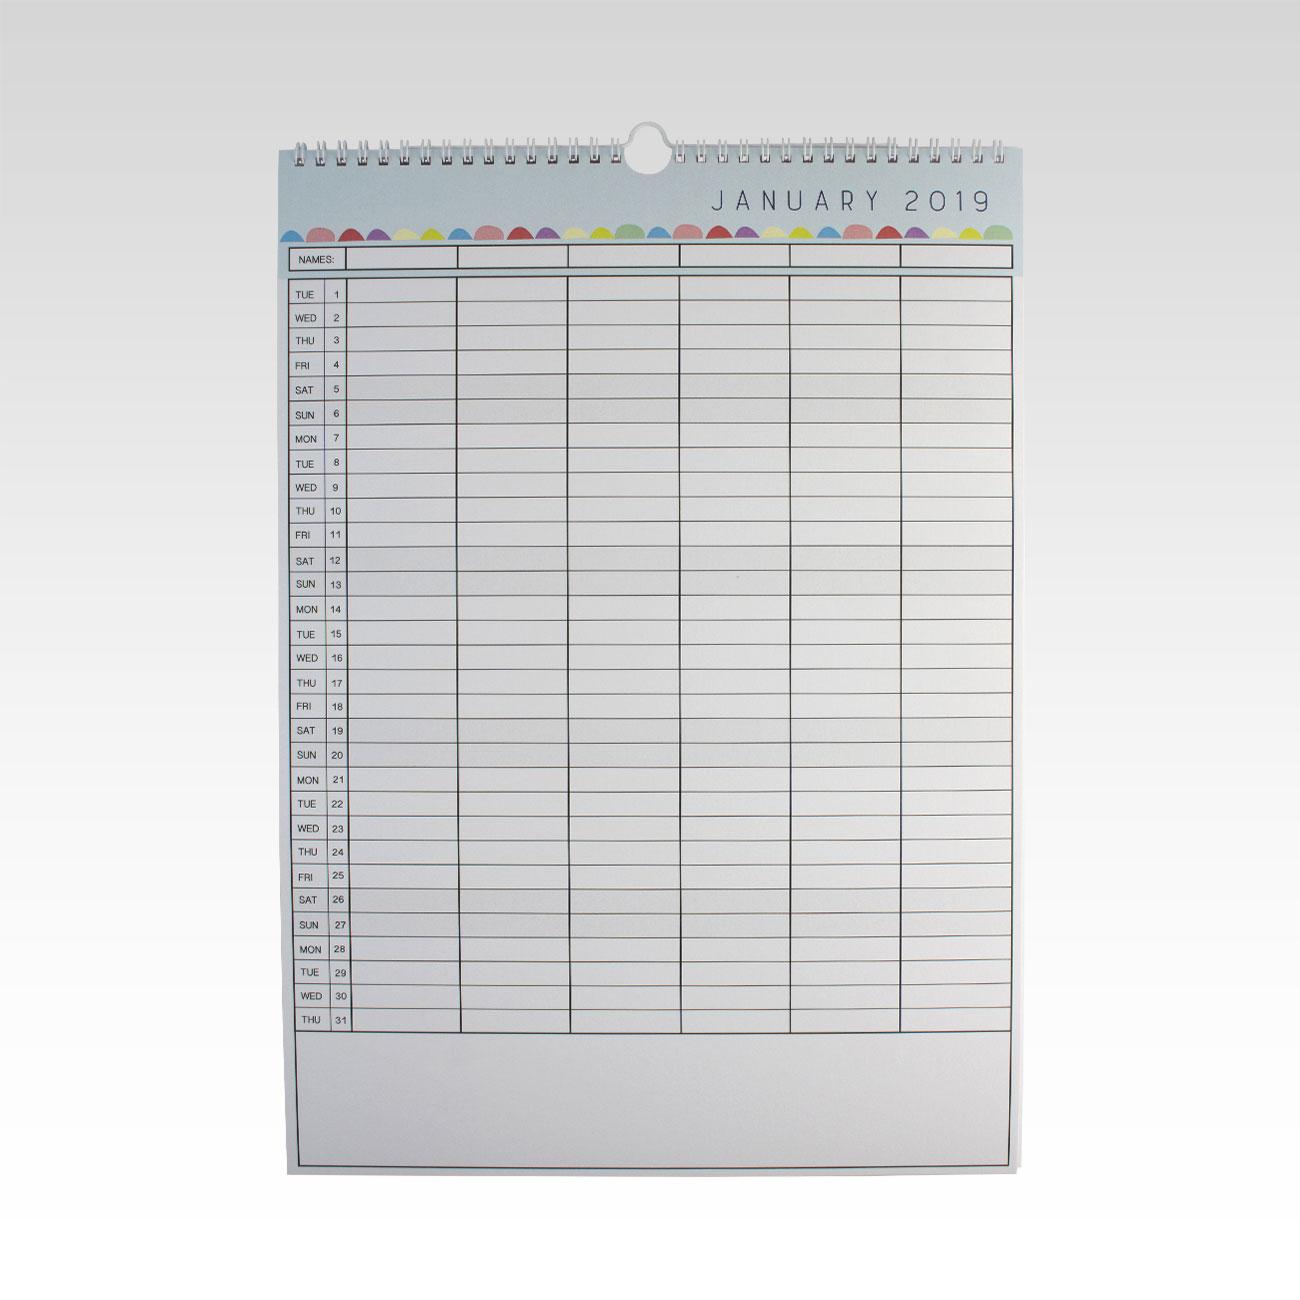 2019 family planner calendar rhicreative